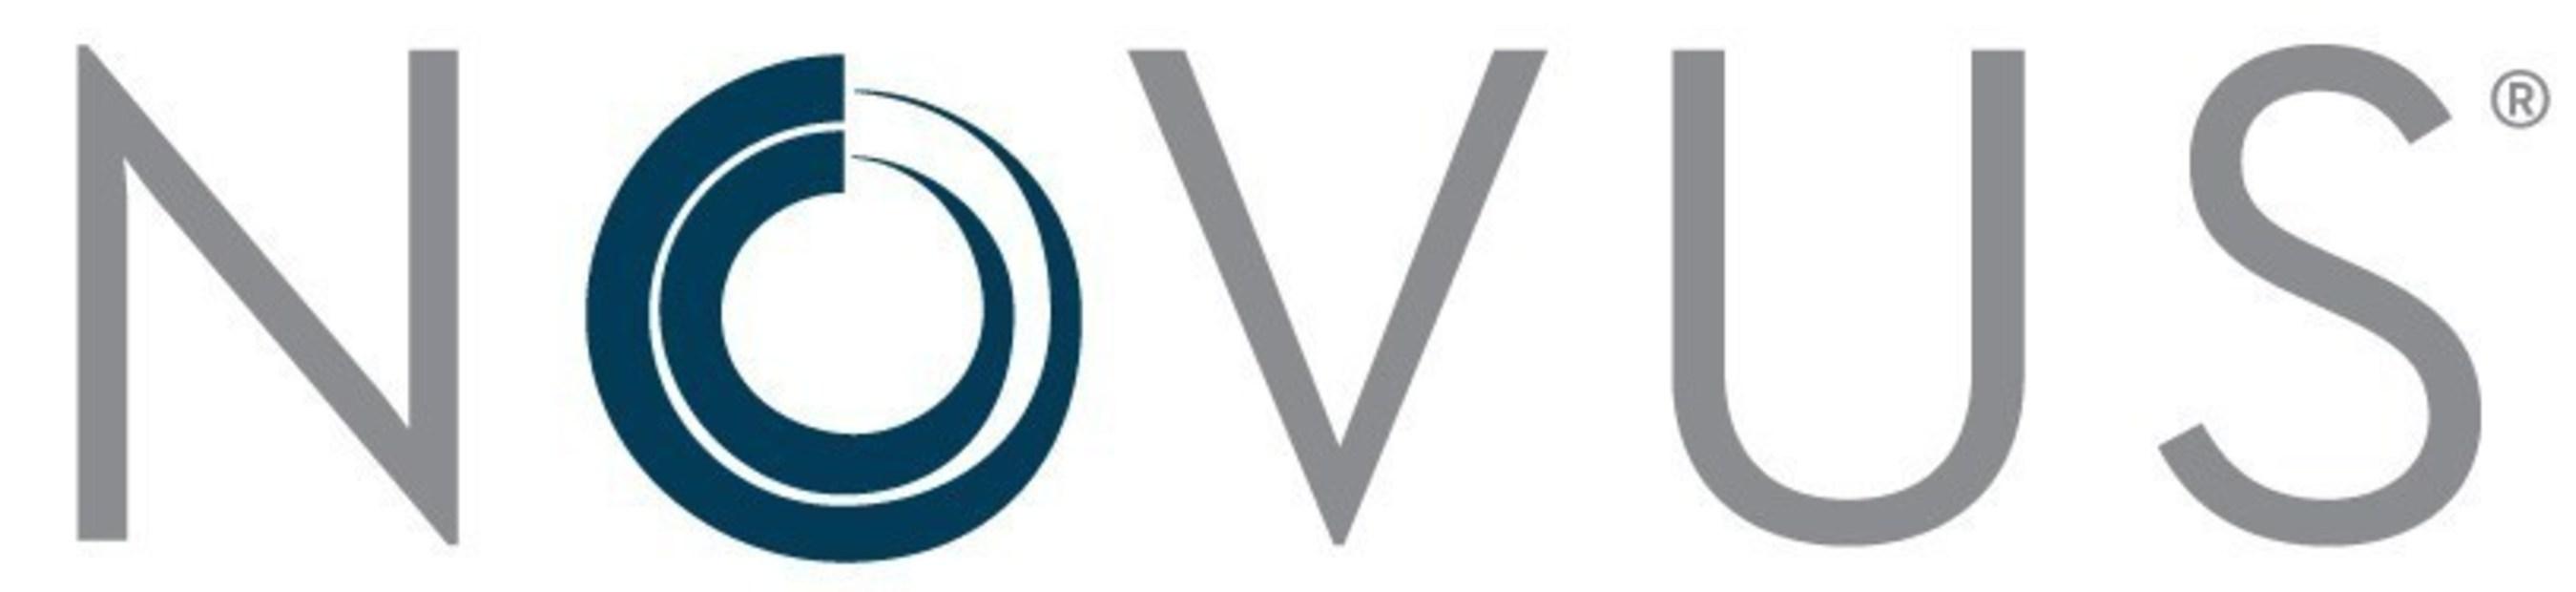 Novus Employees Donate One Million Dollars to Local Charities